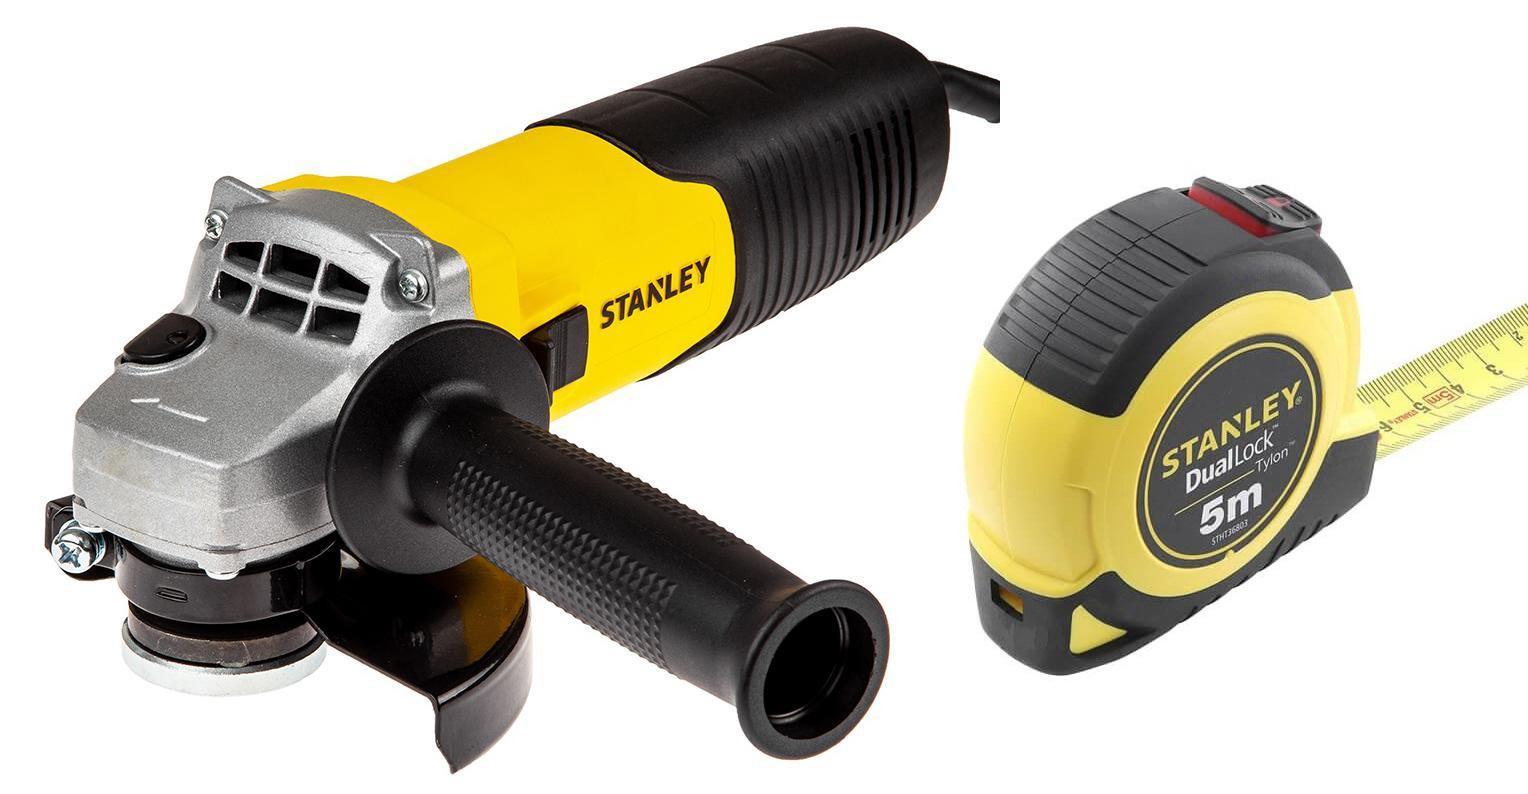 Набор Stanley УШМ (болгарка) stgs9115-b9 +Рулетка stht36803-0 набор stanley ушм болгарка stgs7115 b9 рулетка dwht033662